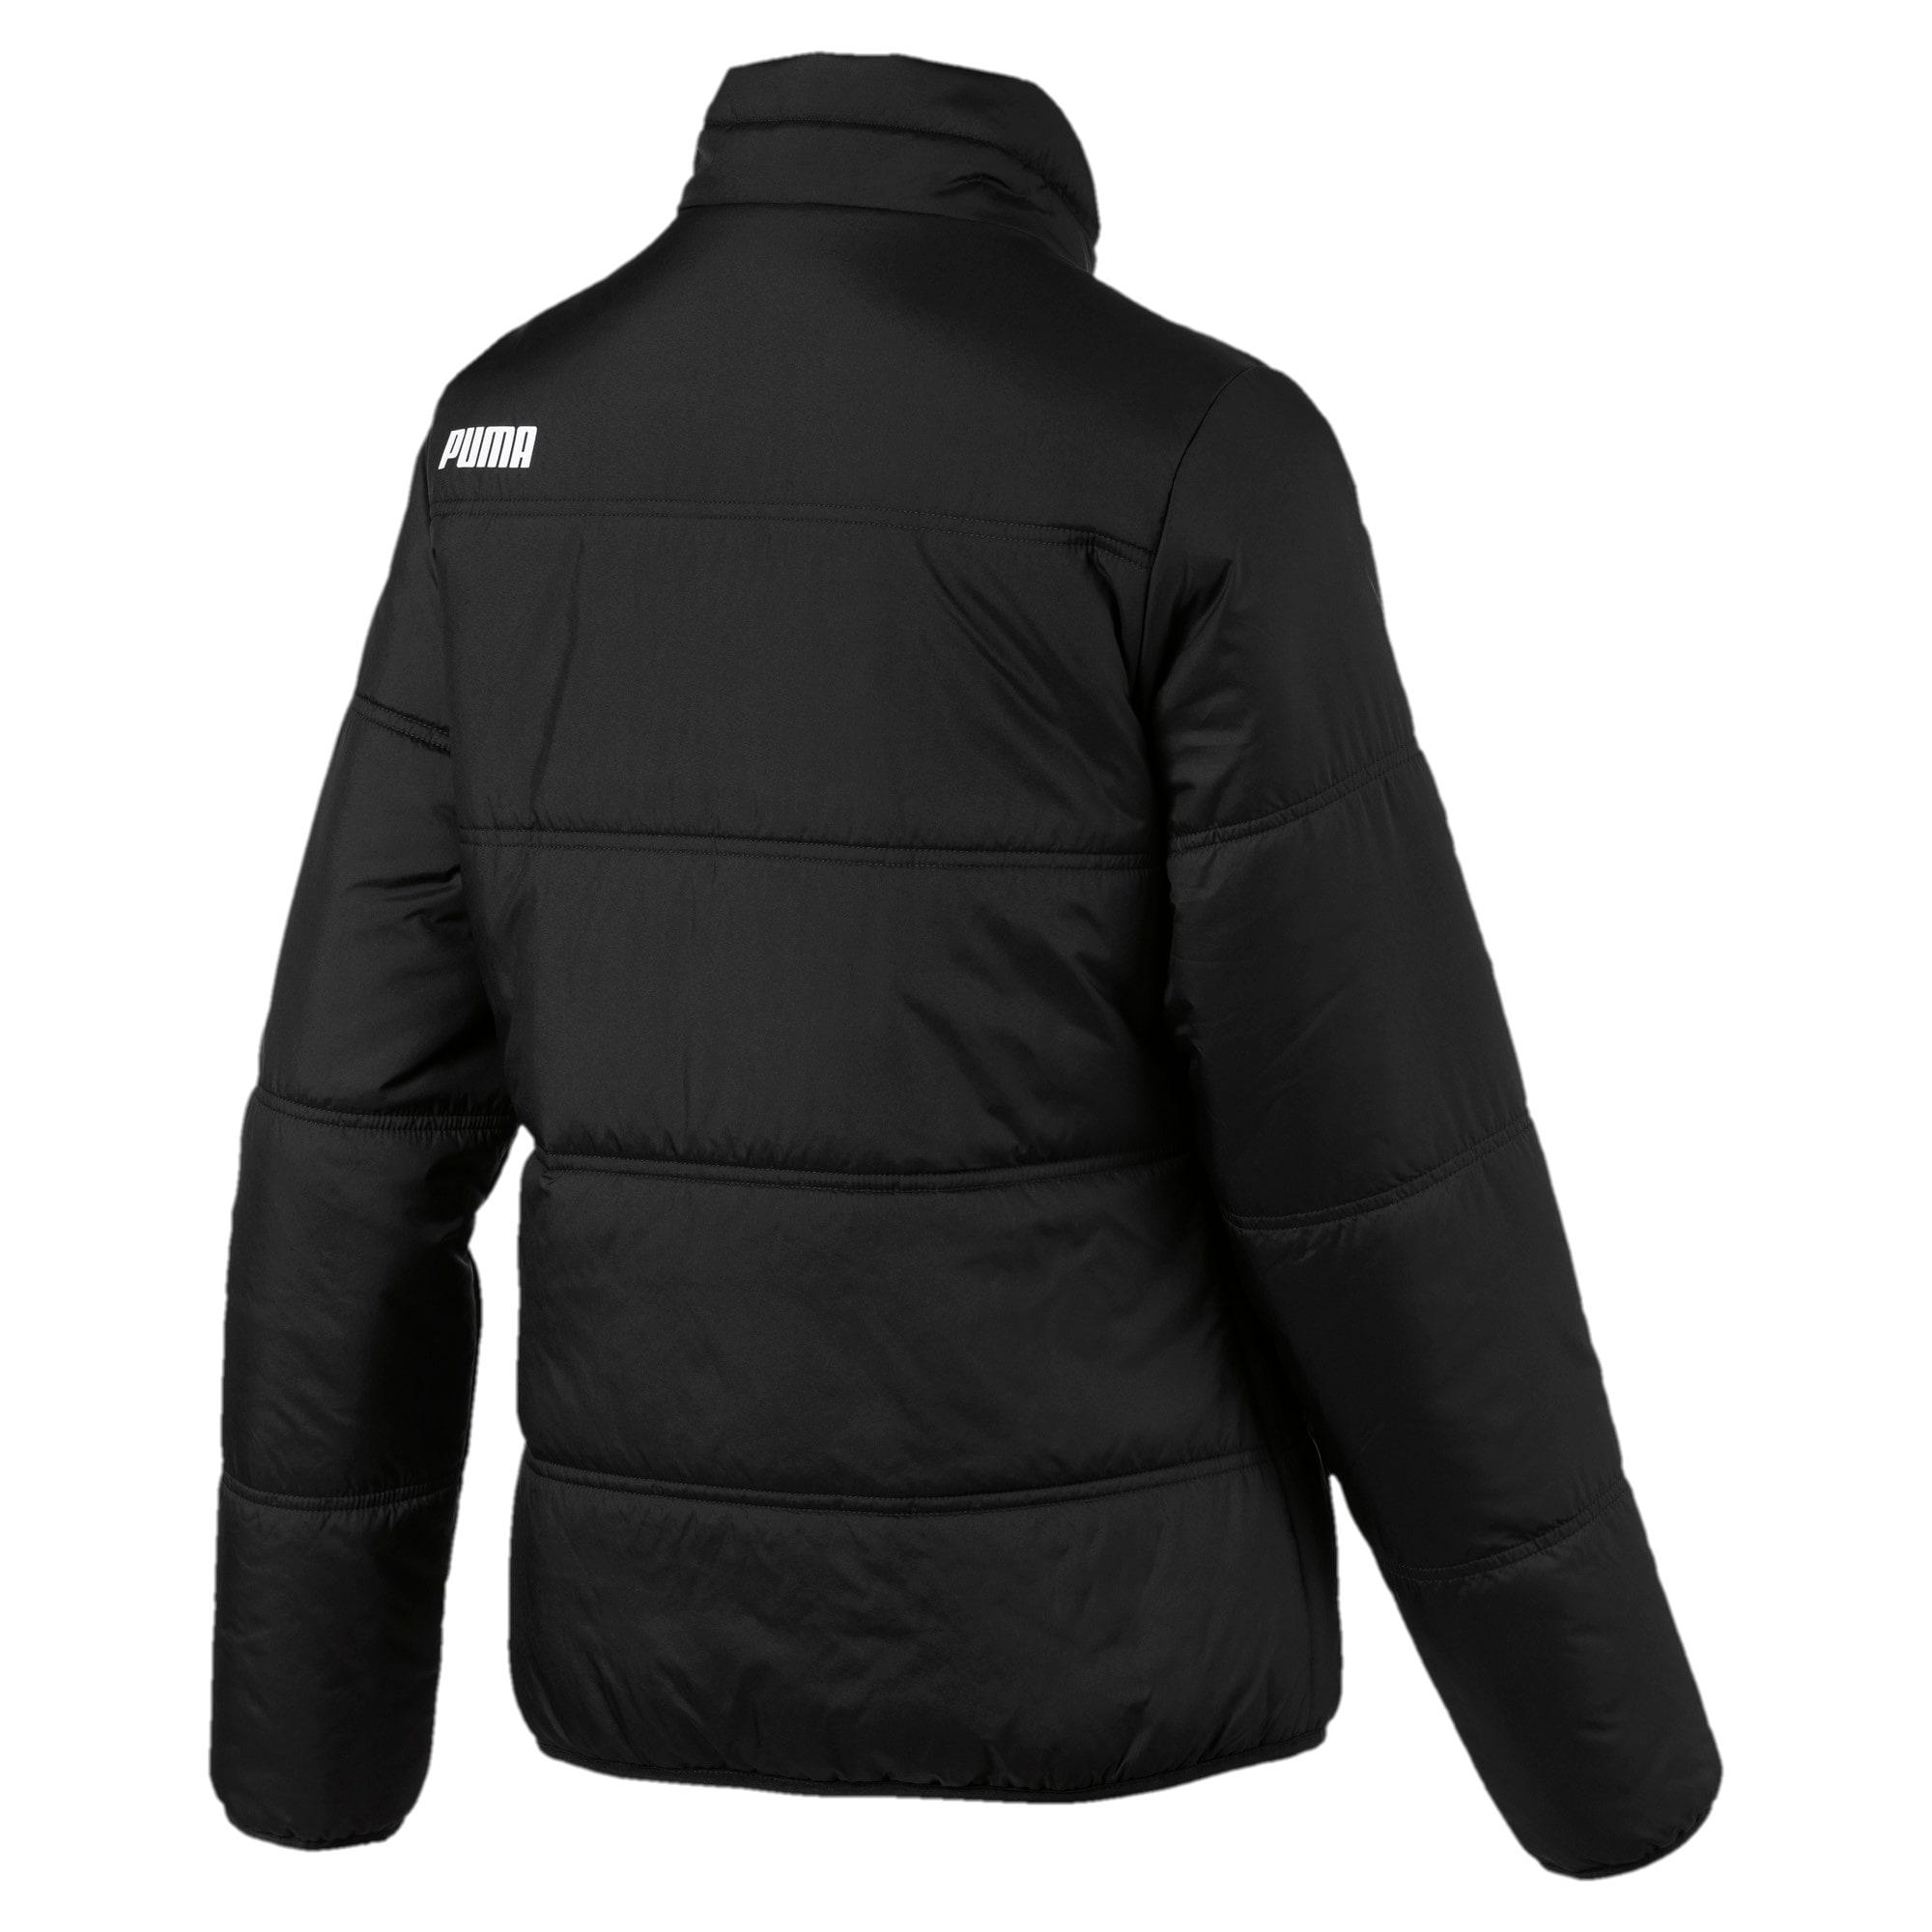 Thumbnail 5 of Essentials Padded Women's Jacket, Puma Black, medium